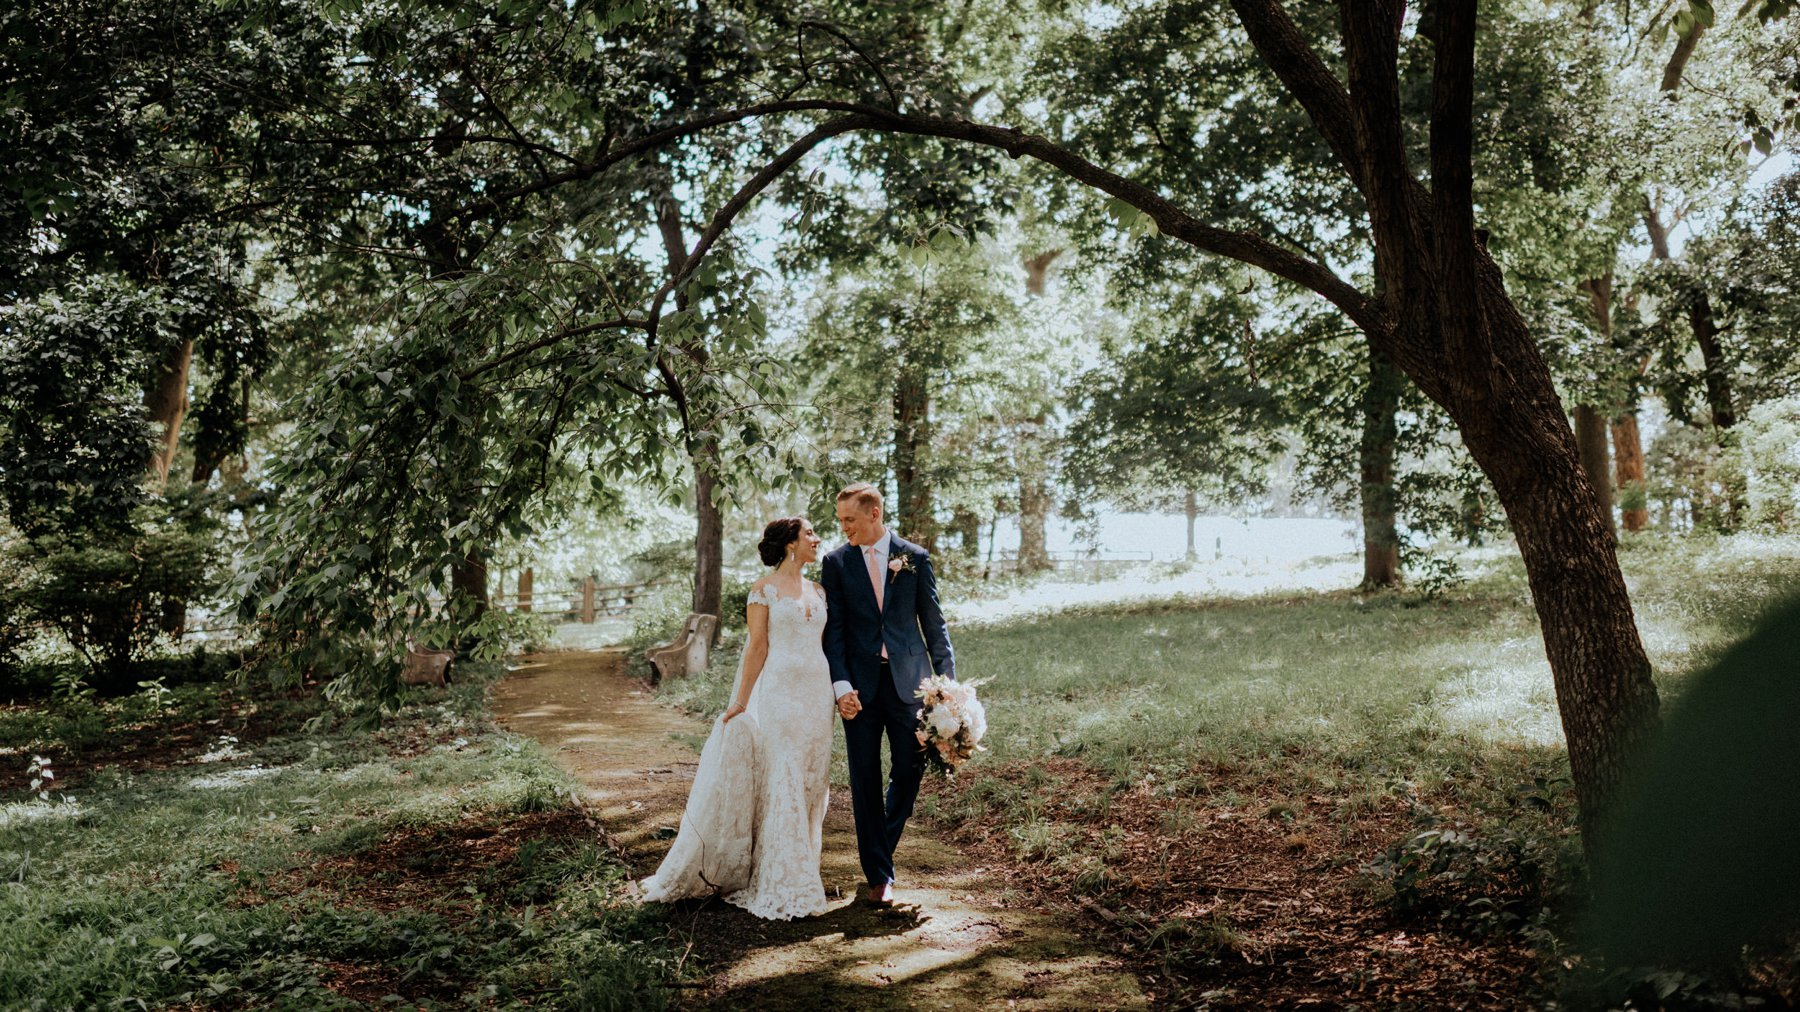 006-005-bartram-gardens-wedding-7.jpg